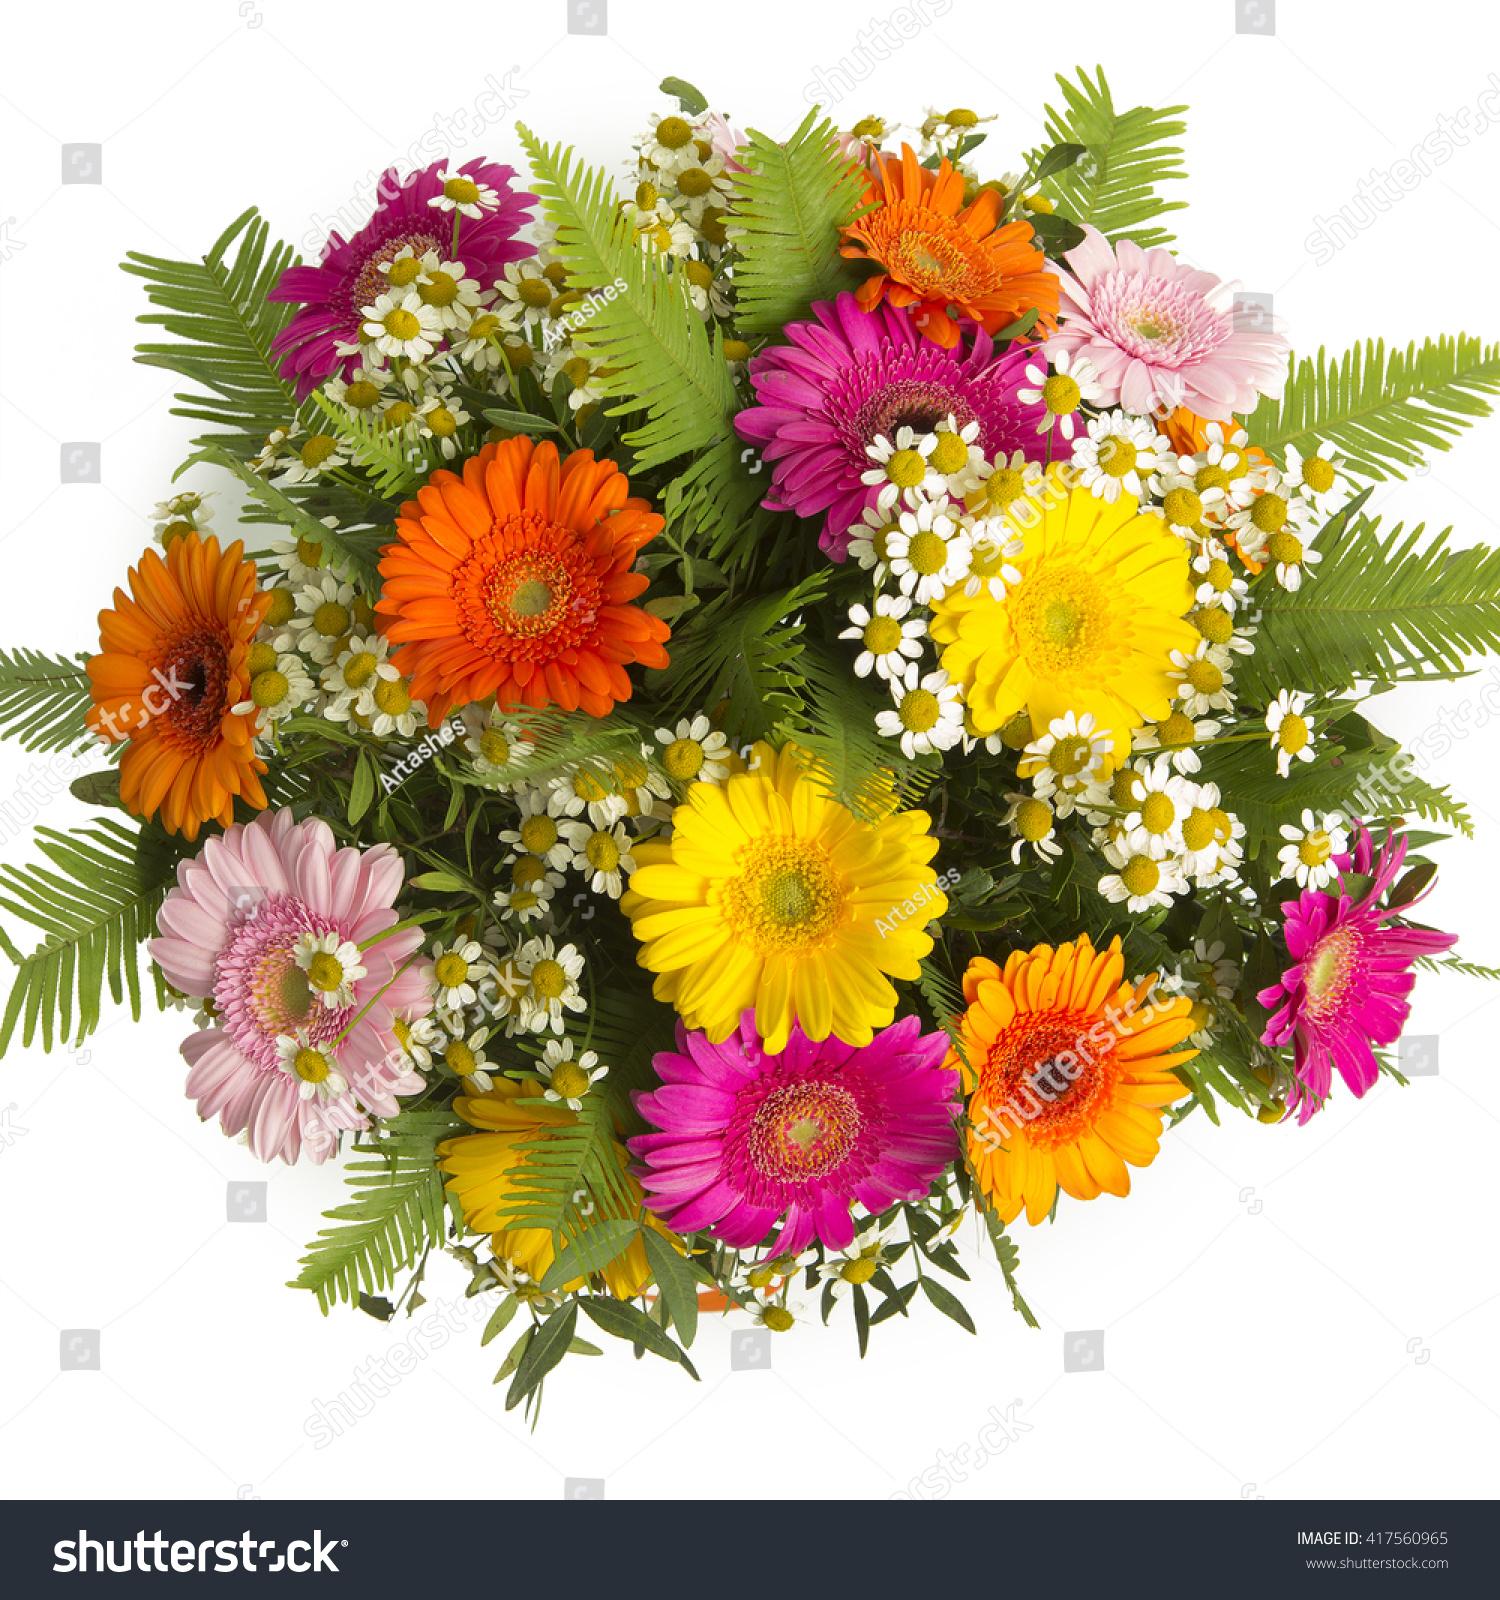 Colorful Bouquet Gerberas Wild Flowers Stock Photo (Edit Now ...